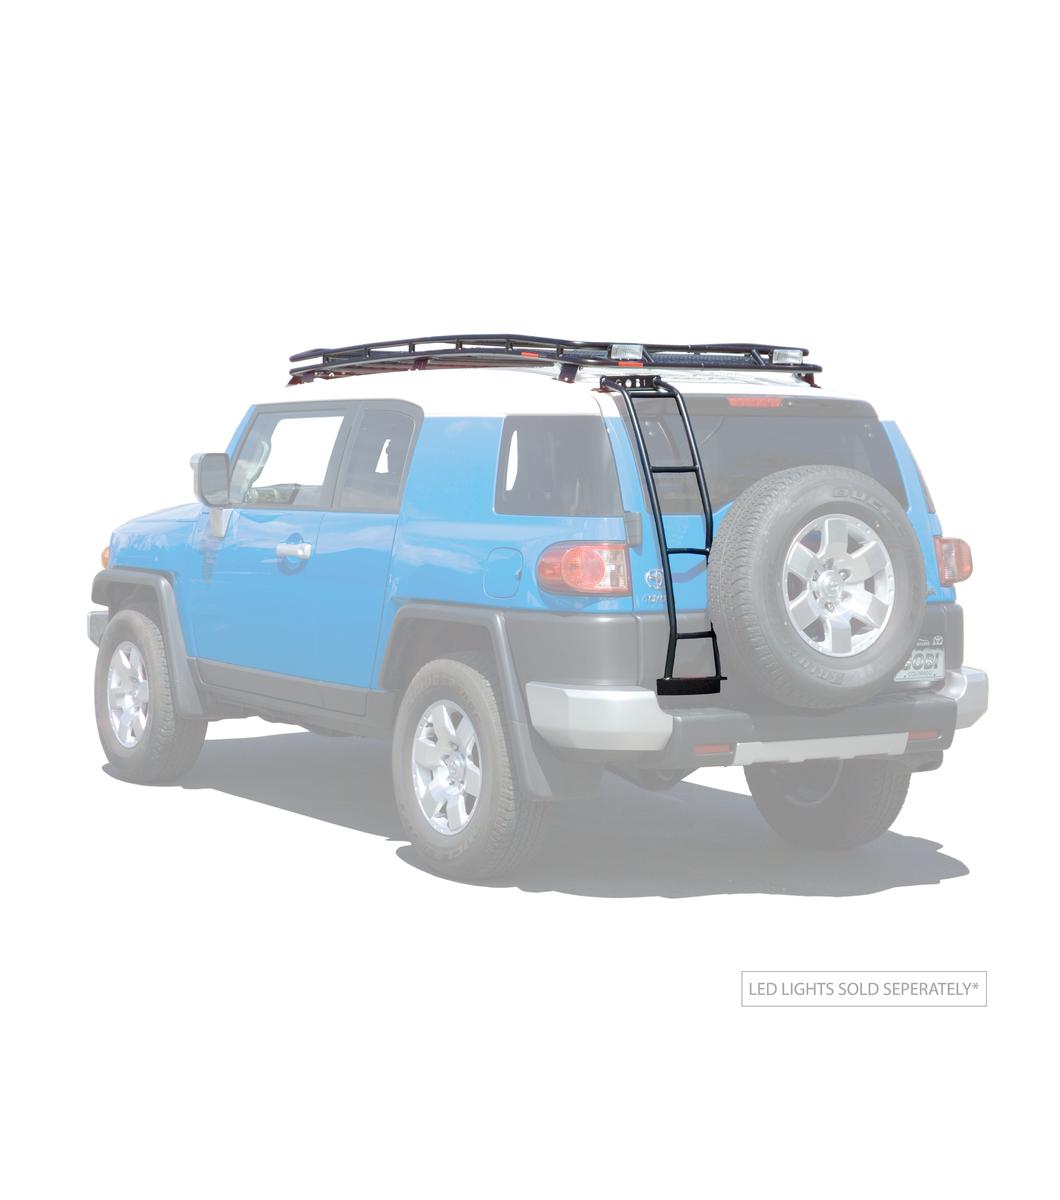 Gobi Toyota Fj Stealth Rack Multi Light Setup No Sunroof